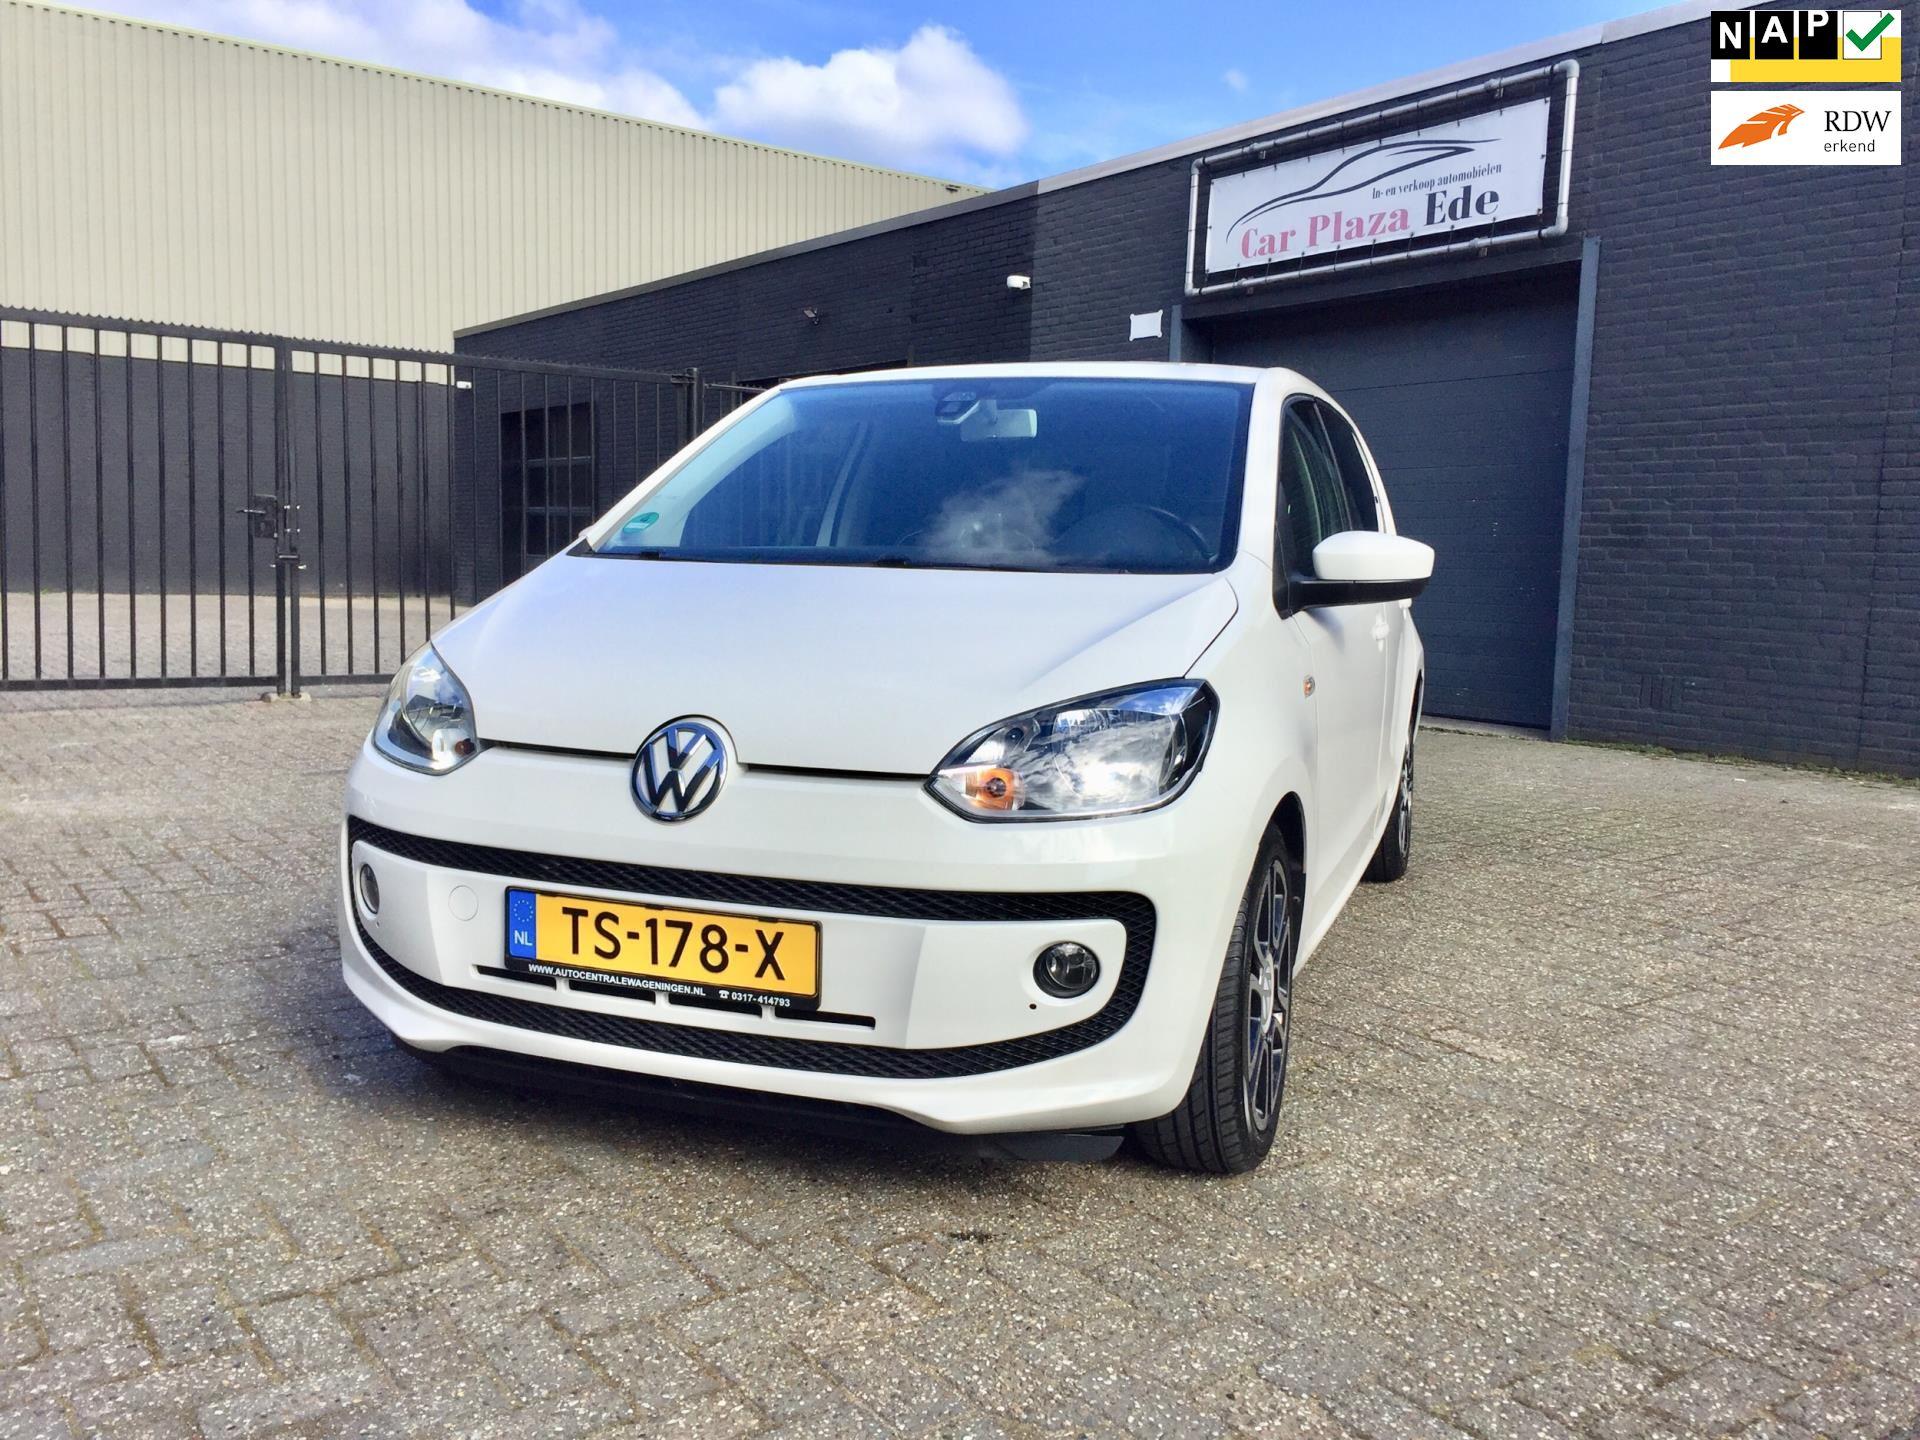 Volkswagen Up occasion - Carplaza Ede